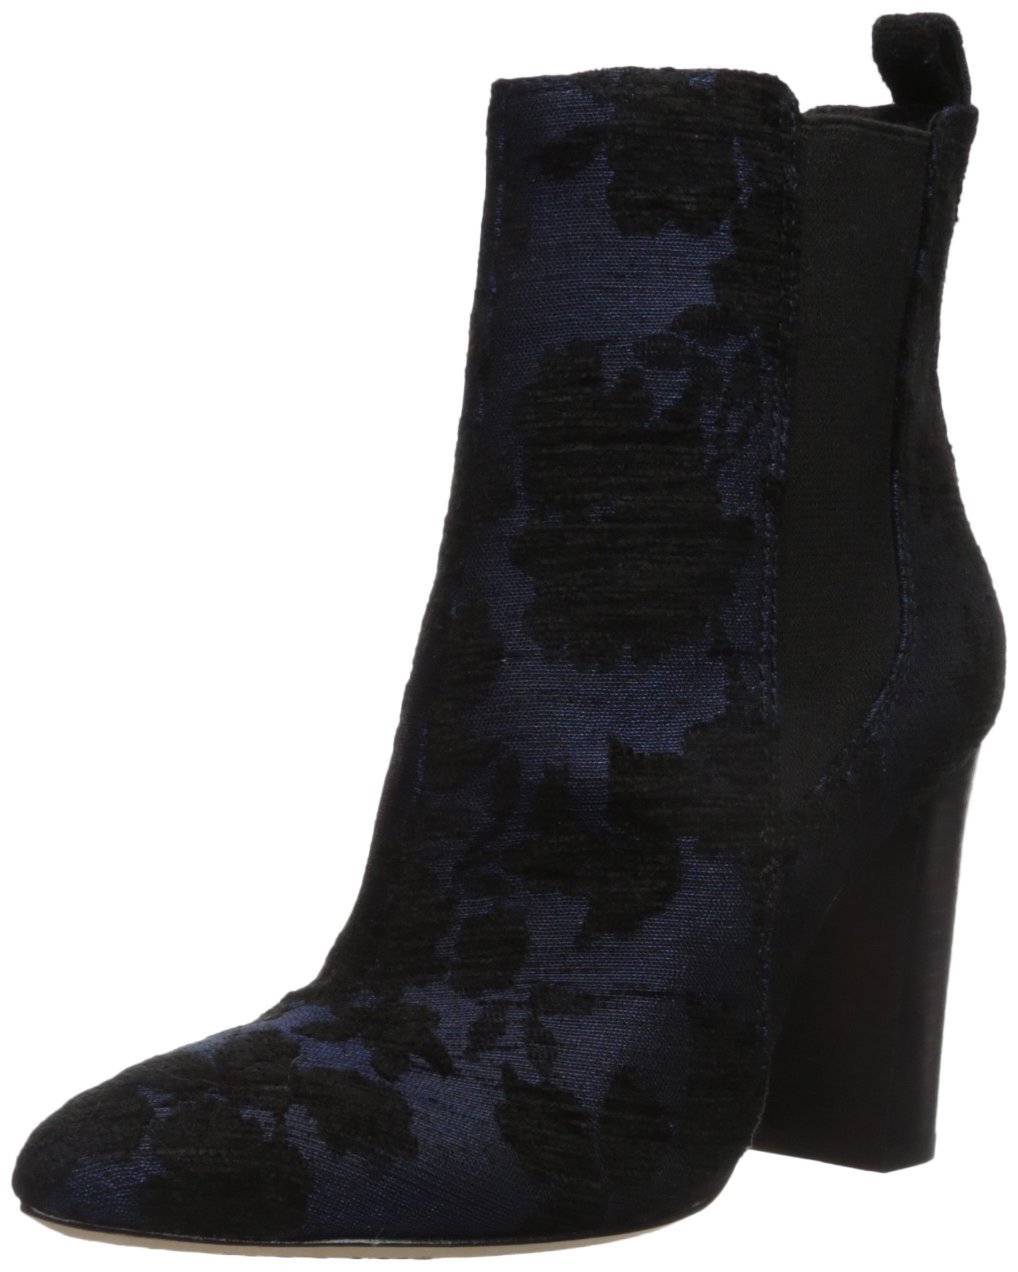 Vince Camuto Women's Britsy Ankle Boot B072LVP3DX 8.5 B(M) US Black Multi/Black